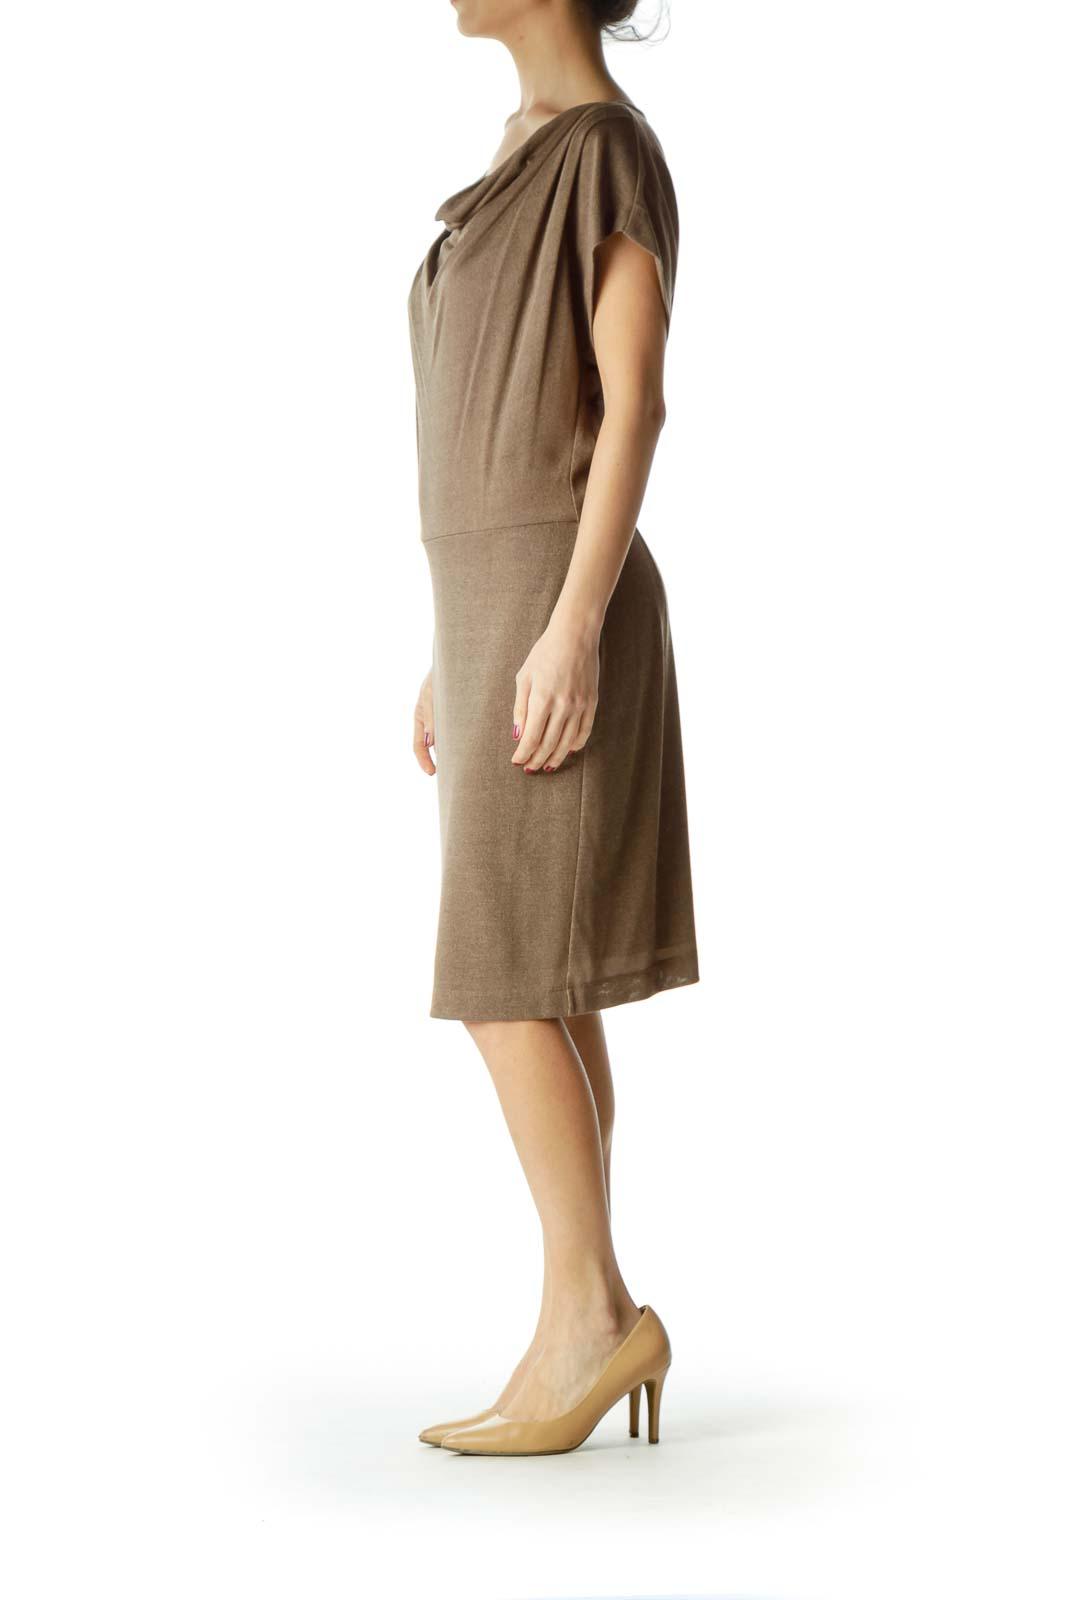 Beige Sheer Slim Short Sleeve Knit Dress